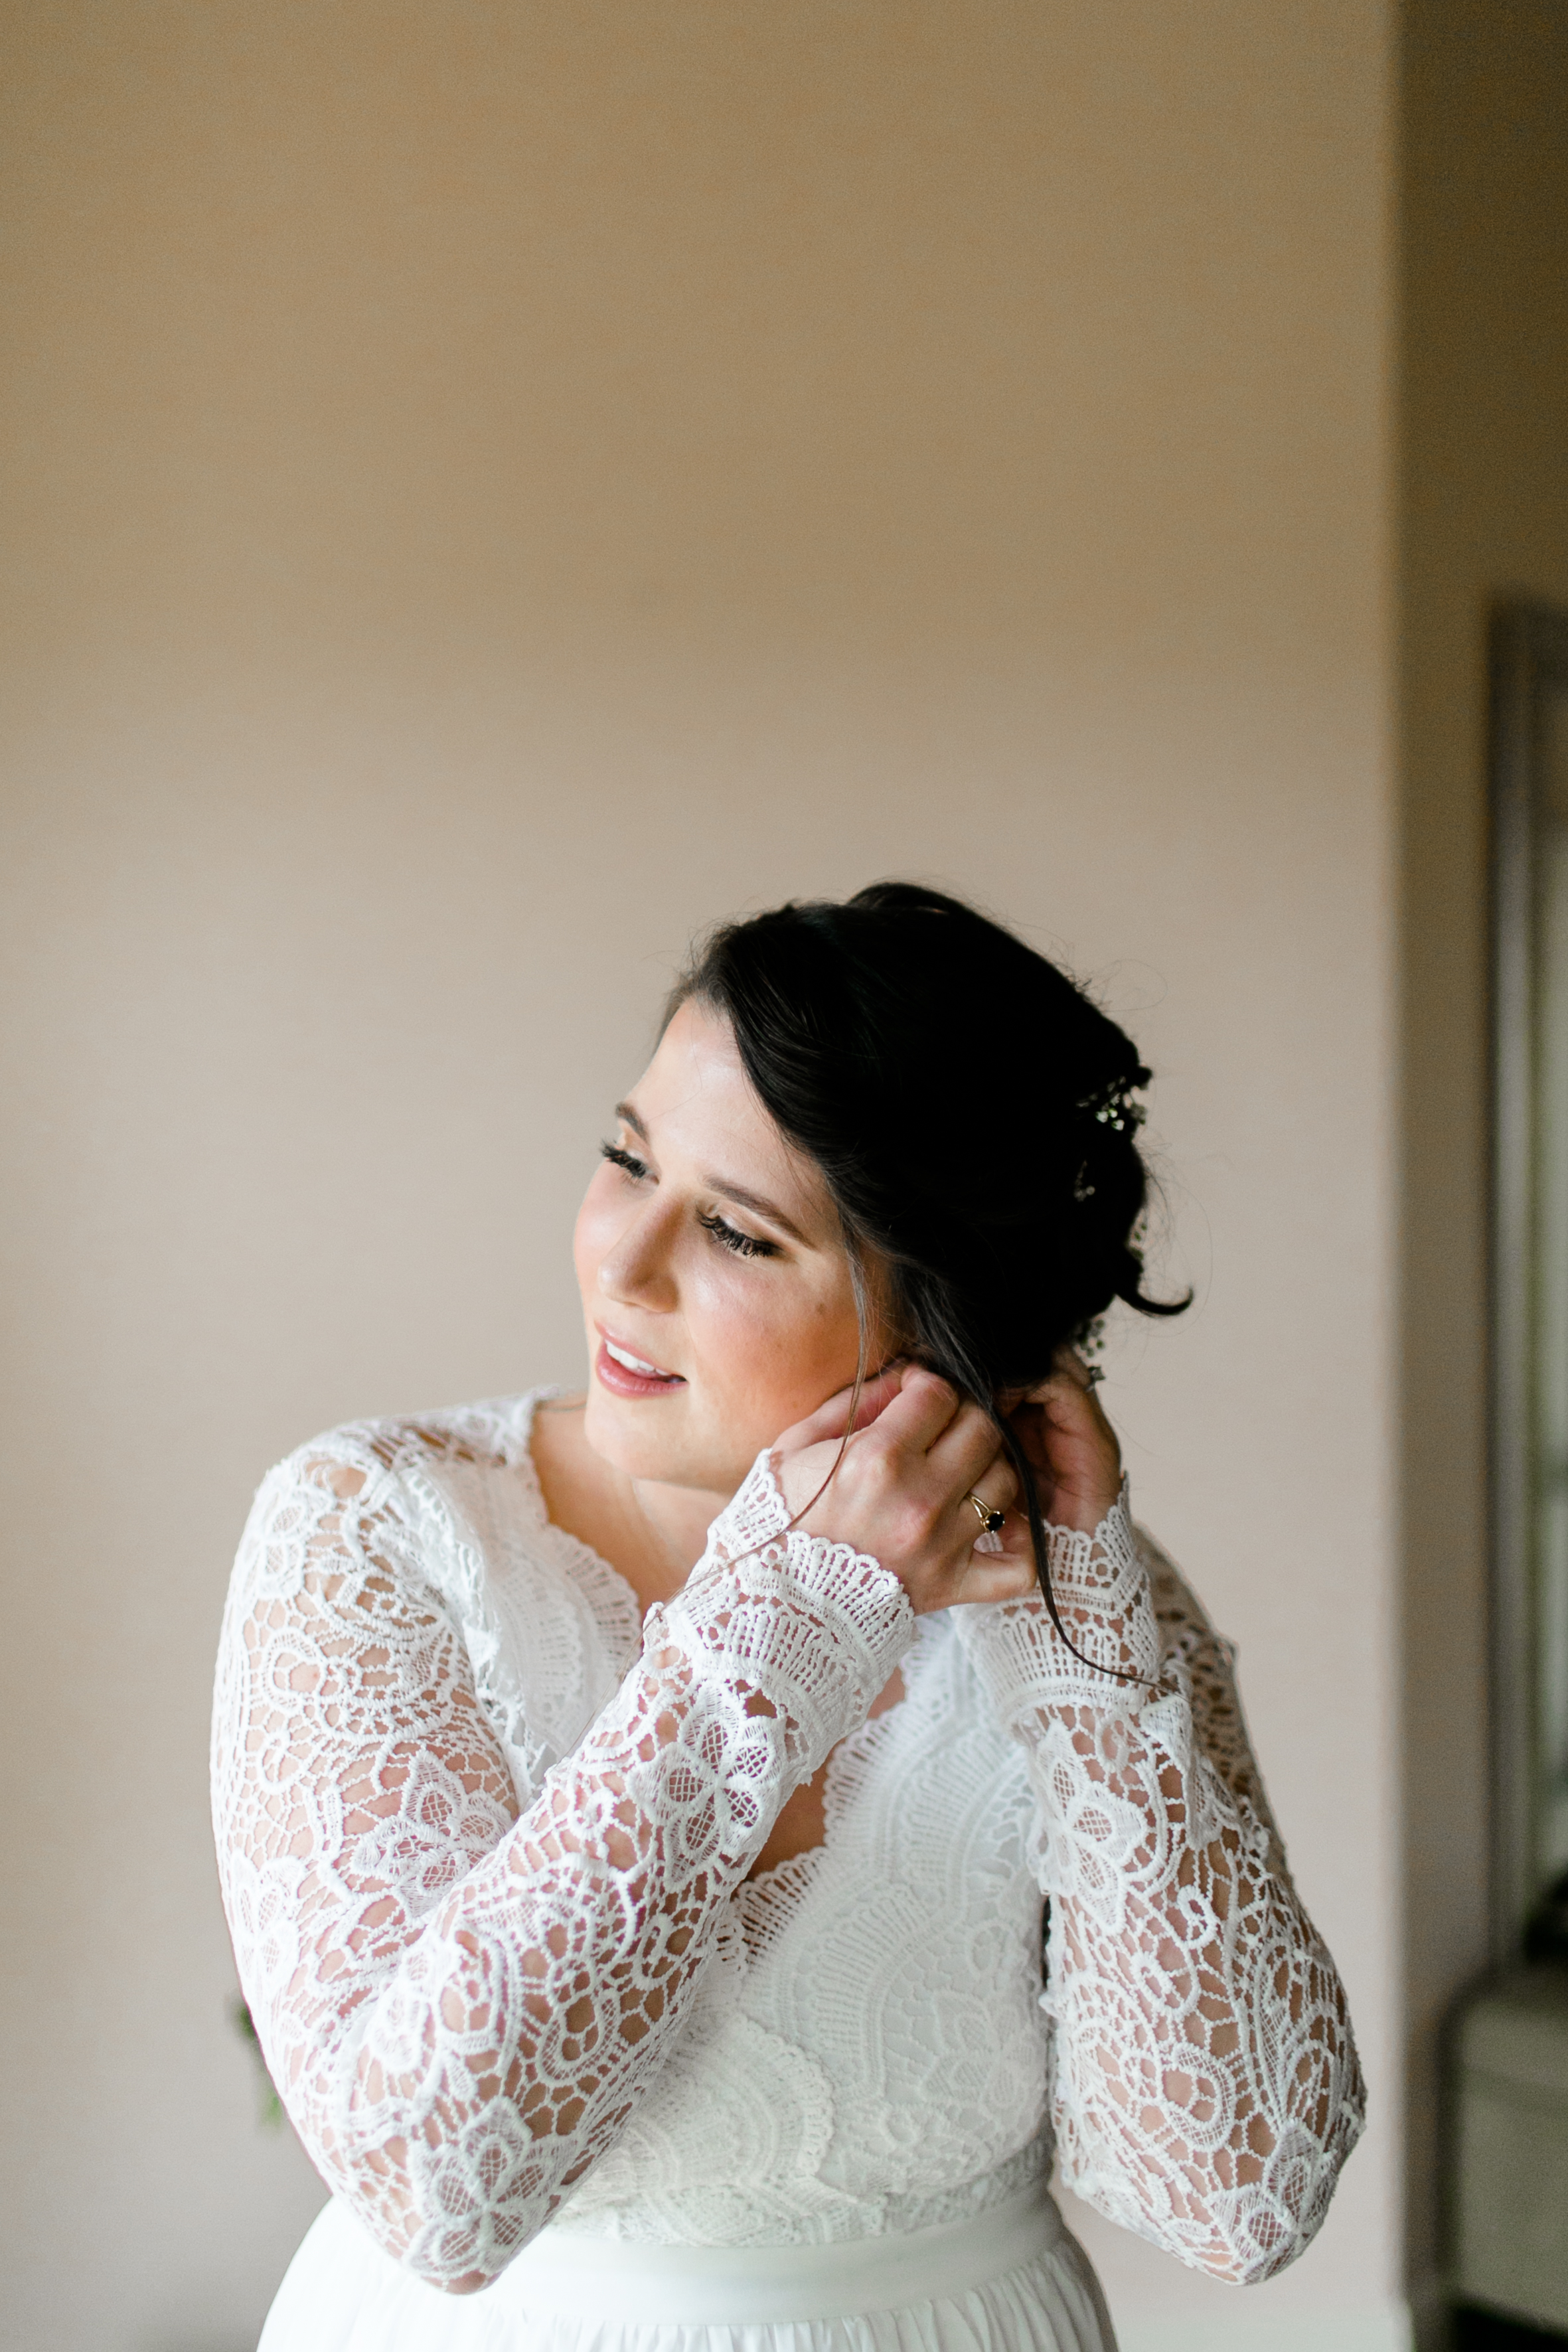 Austin_Texas_Fine_Art_Wedding_Photographer_Kayla_Snell_Photography_Antebellum_Oaks129.jpg